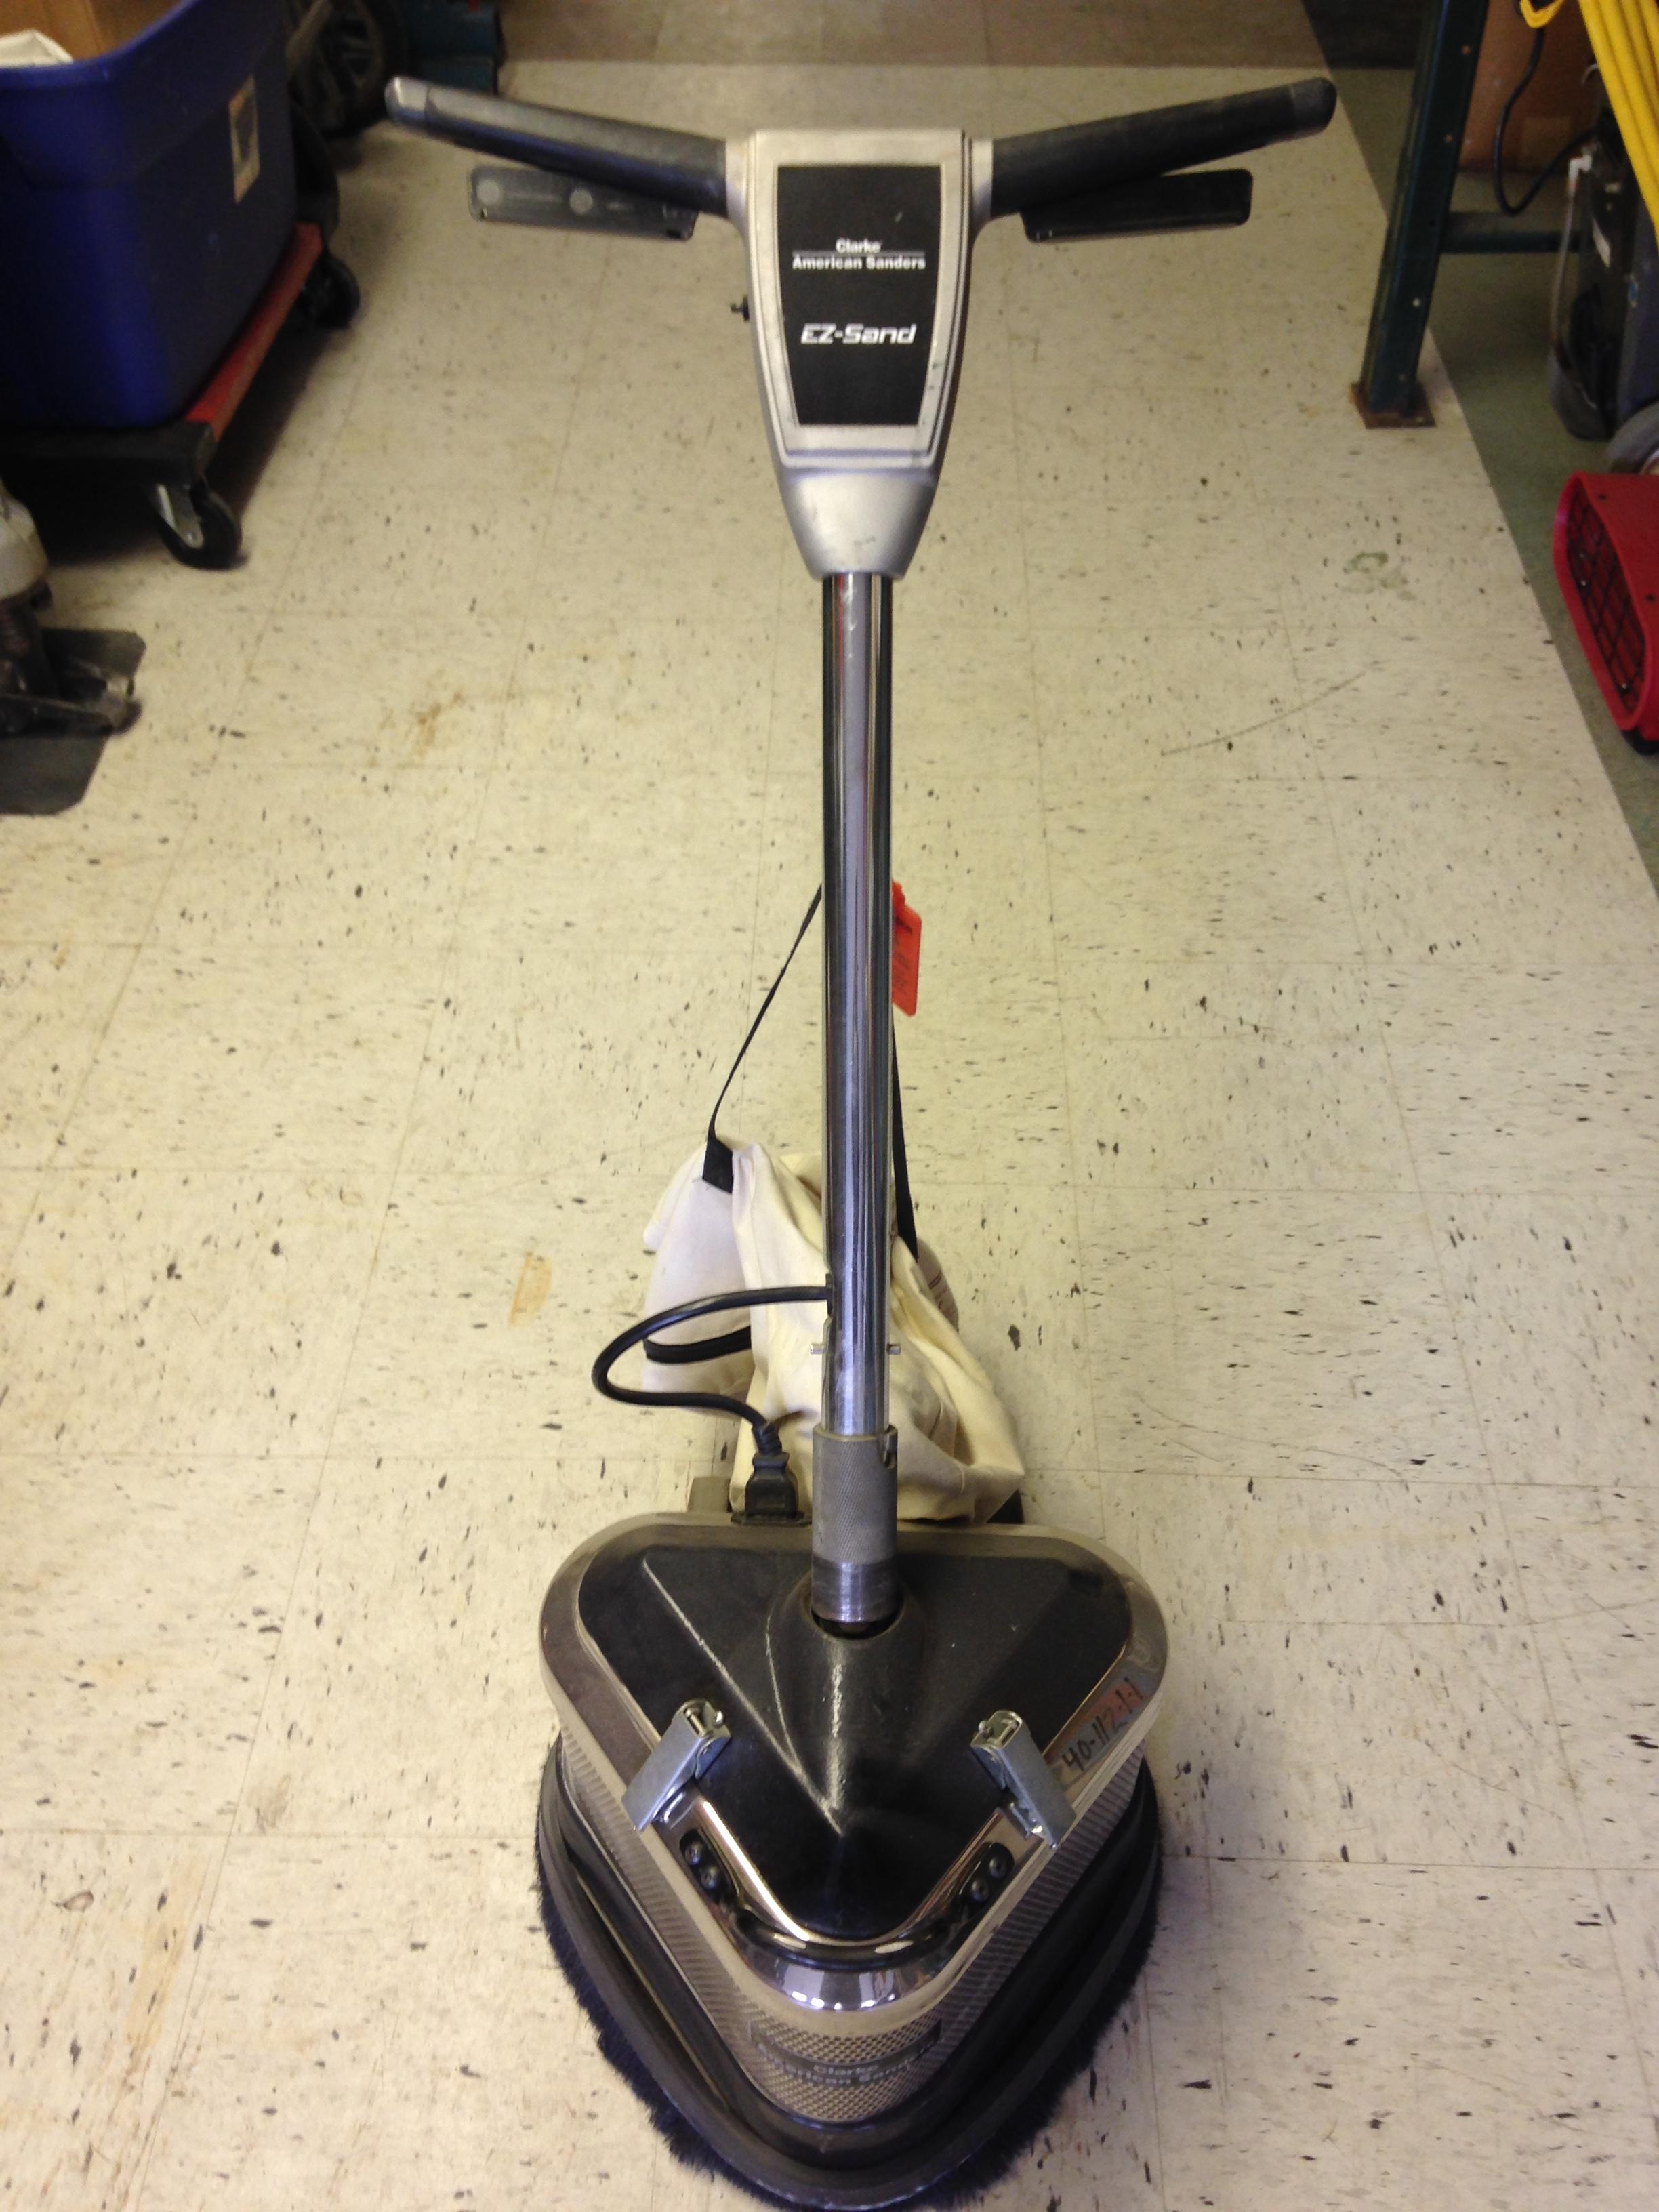 product grainger hp blades stripper machine roberts floors floor w